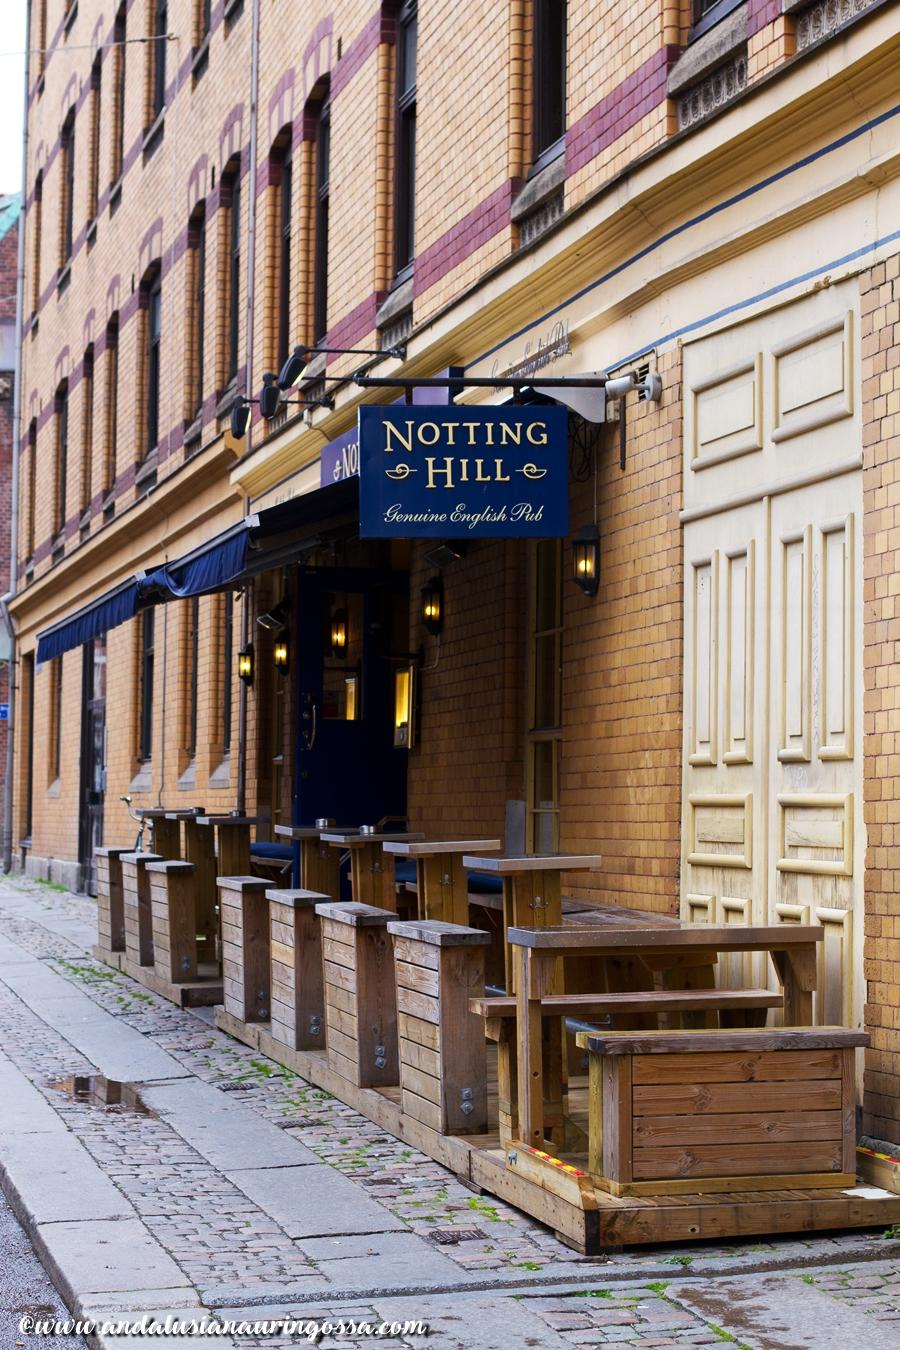 Andalusian auringossa_kulinaristin Göteborg_Andra Långgatan